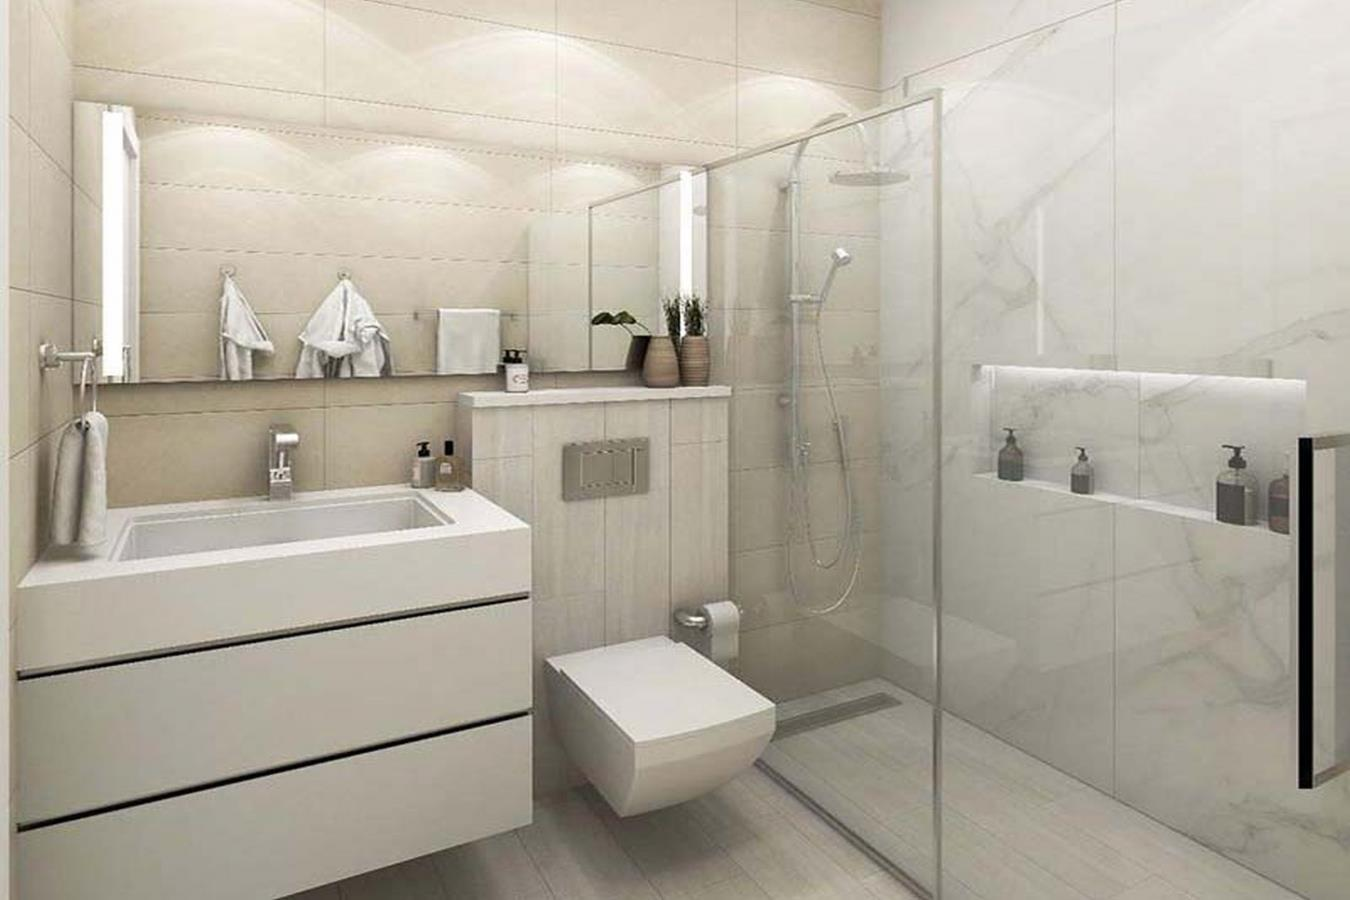 2 Bedroom in Meydan with Best Payment Terms